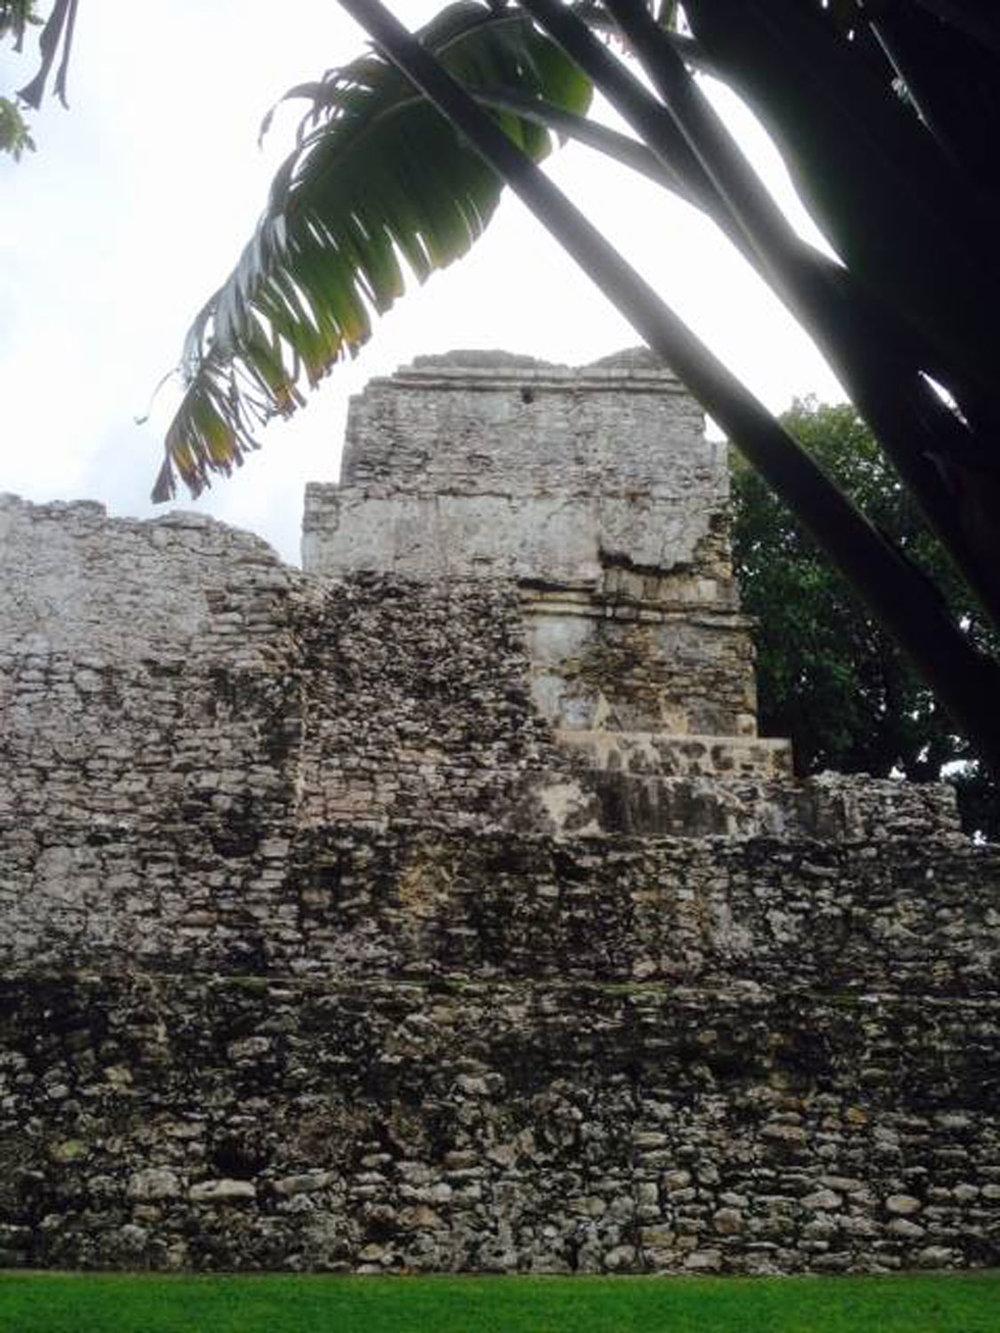 Hammocks_and_Ruins_Things_To_Do_Cancun_Explore_Riviera_Maya_Mexico_Cancun_Beaches_Ruins_El_Meco_8.jpg